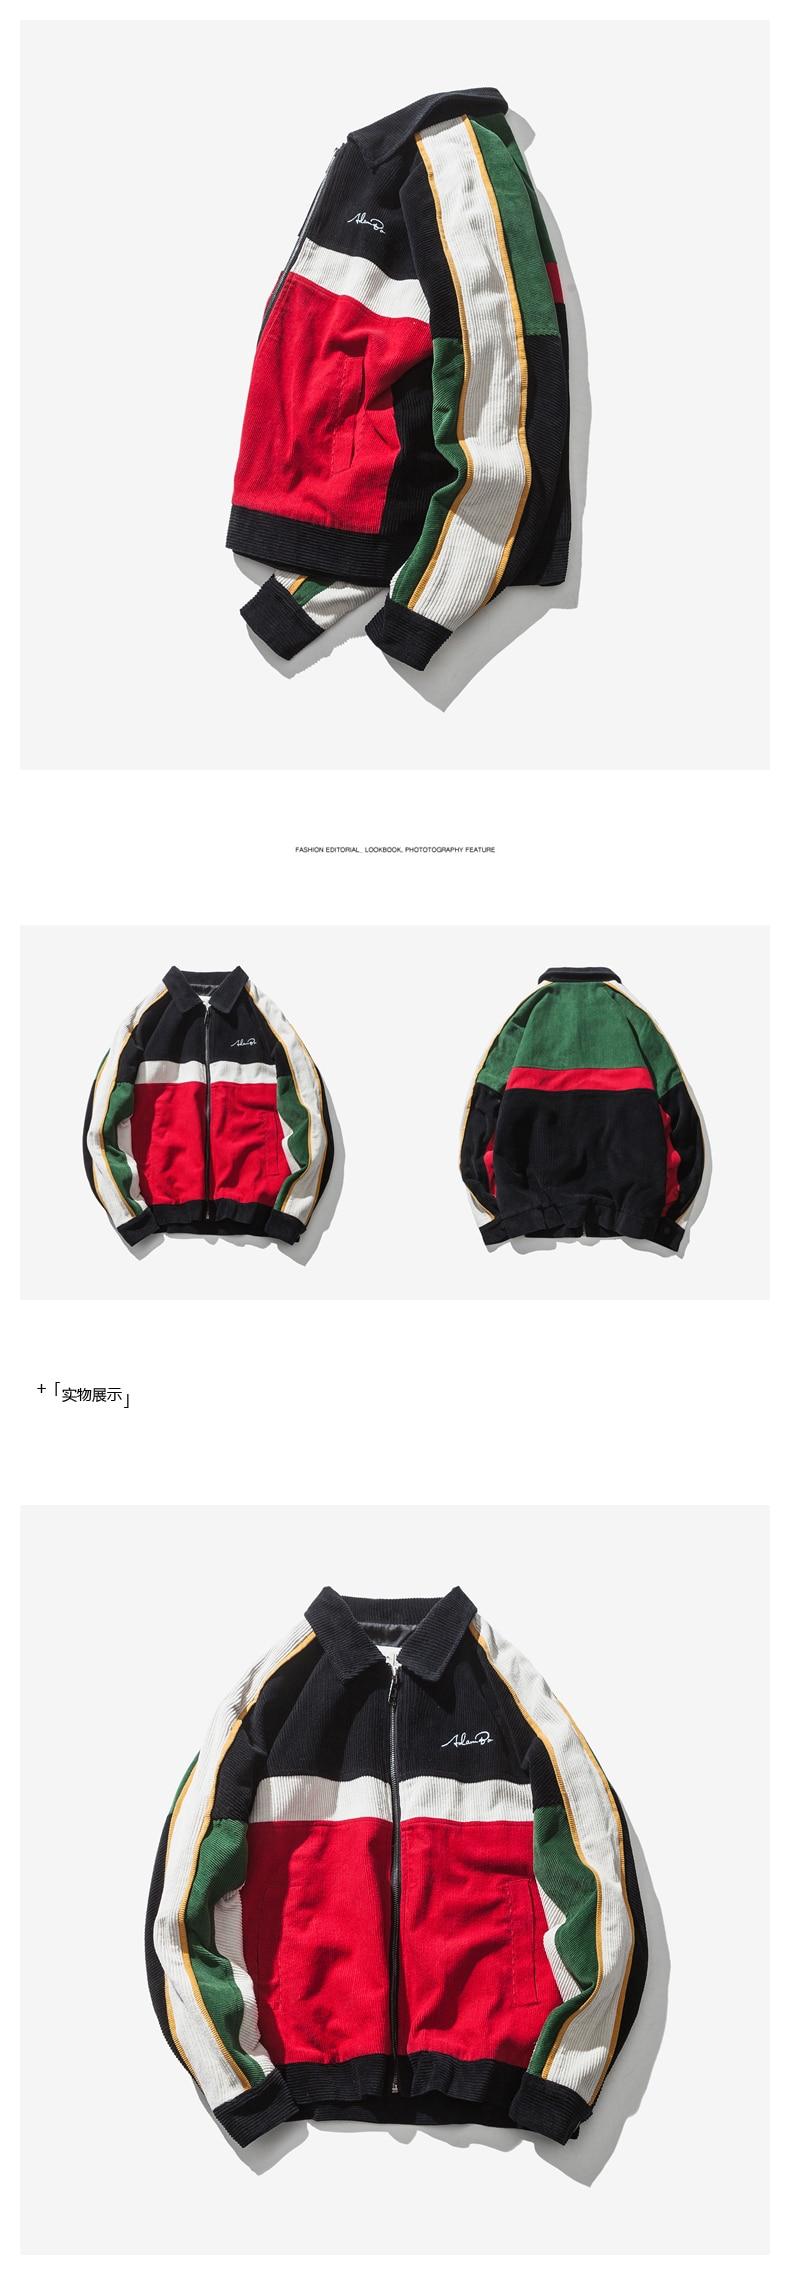 YuWaiJiaRen Autumn Spring Mens Classic Corduroy Jacket Lengthy Sleeve Zipper Free Patchwork Embroidery Males's Clothes HTB1kQhqnBTH8KJjy0Fiq6ARsXXaU